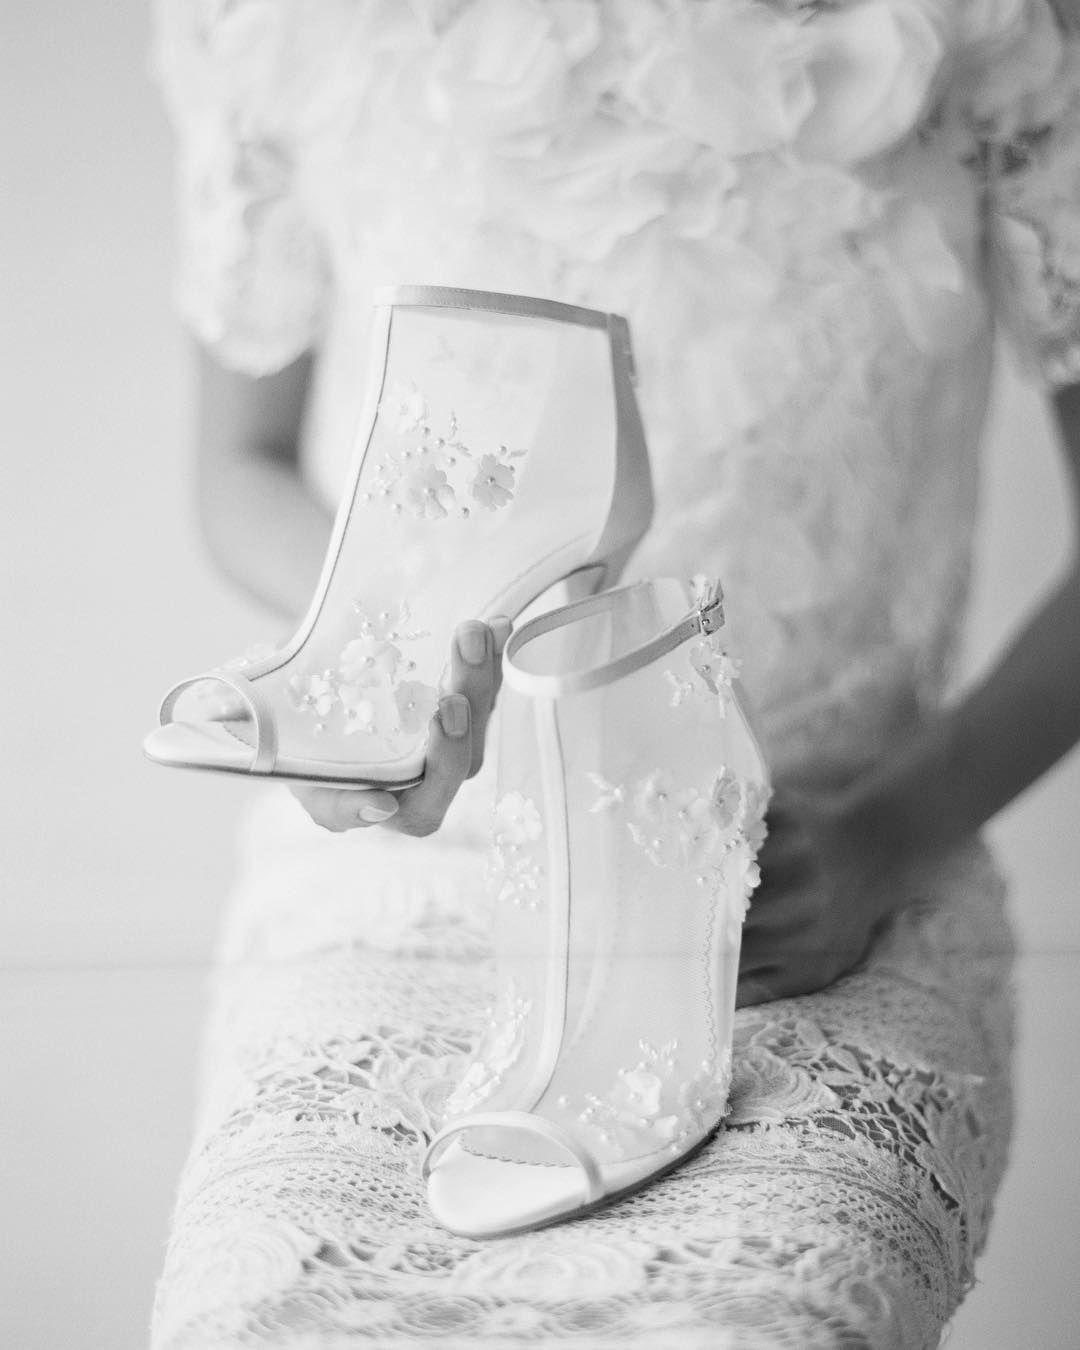 "Bella Belle Shoes (@bellabelleshoes) på Instagram: ""Our @joyproctor for @bellabelleshoes Belle booties captured in B&W by @elizabethmessina is 👌 Gown…"""